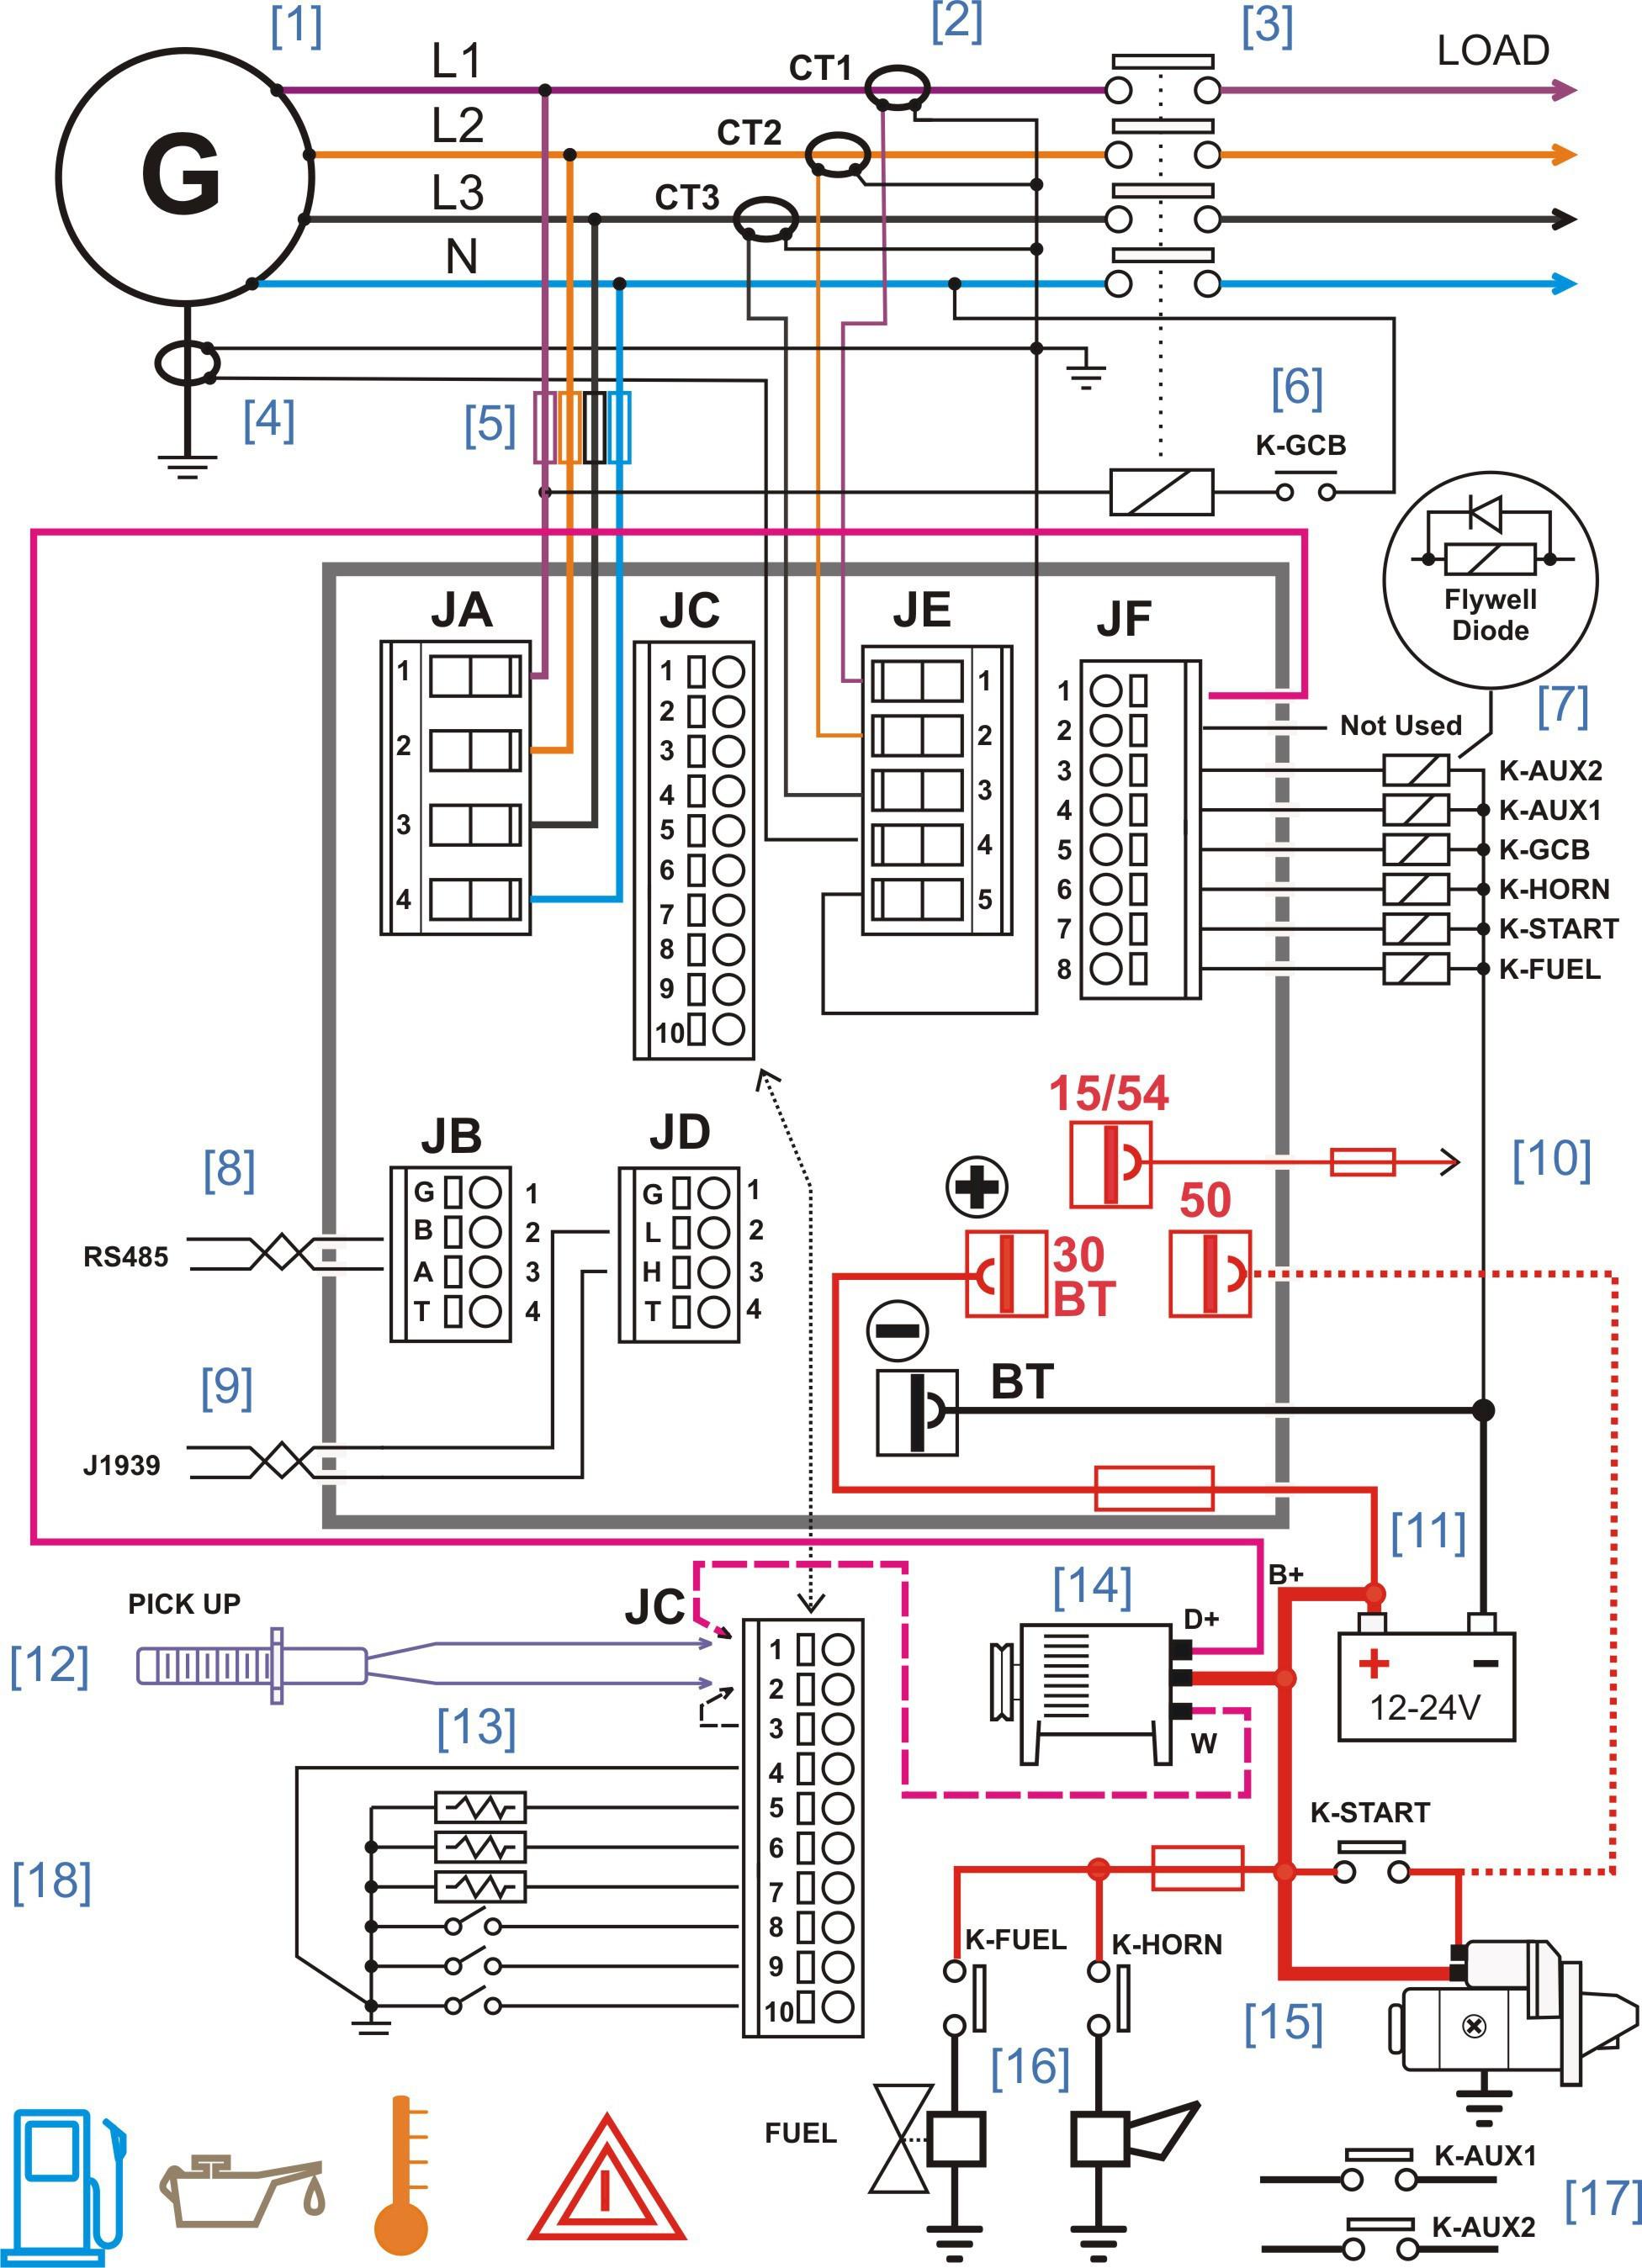 Pleasant Logic Diagram Generator Online Basic Electronics Wiring Diagram Wiring 101 Swasaxxcnl